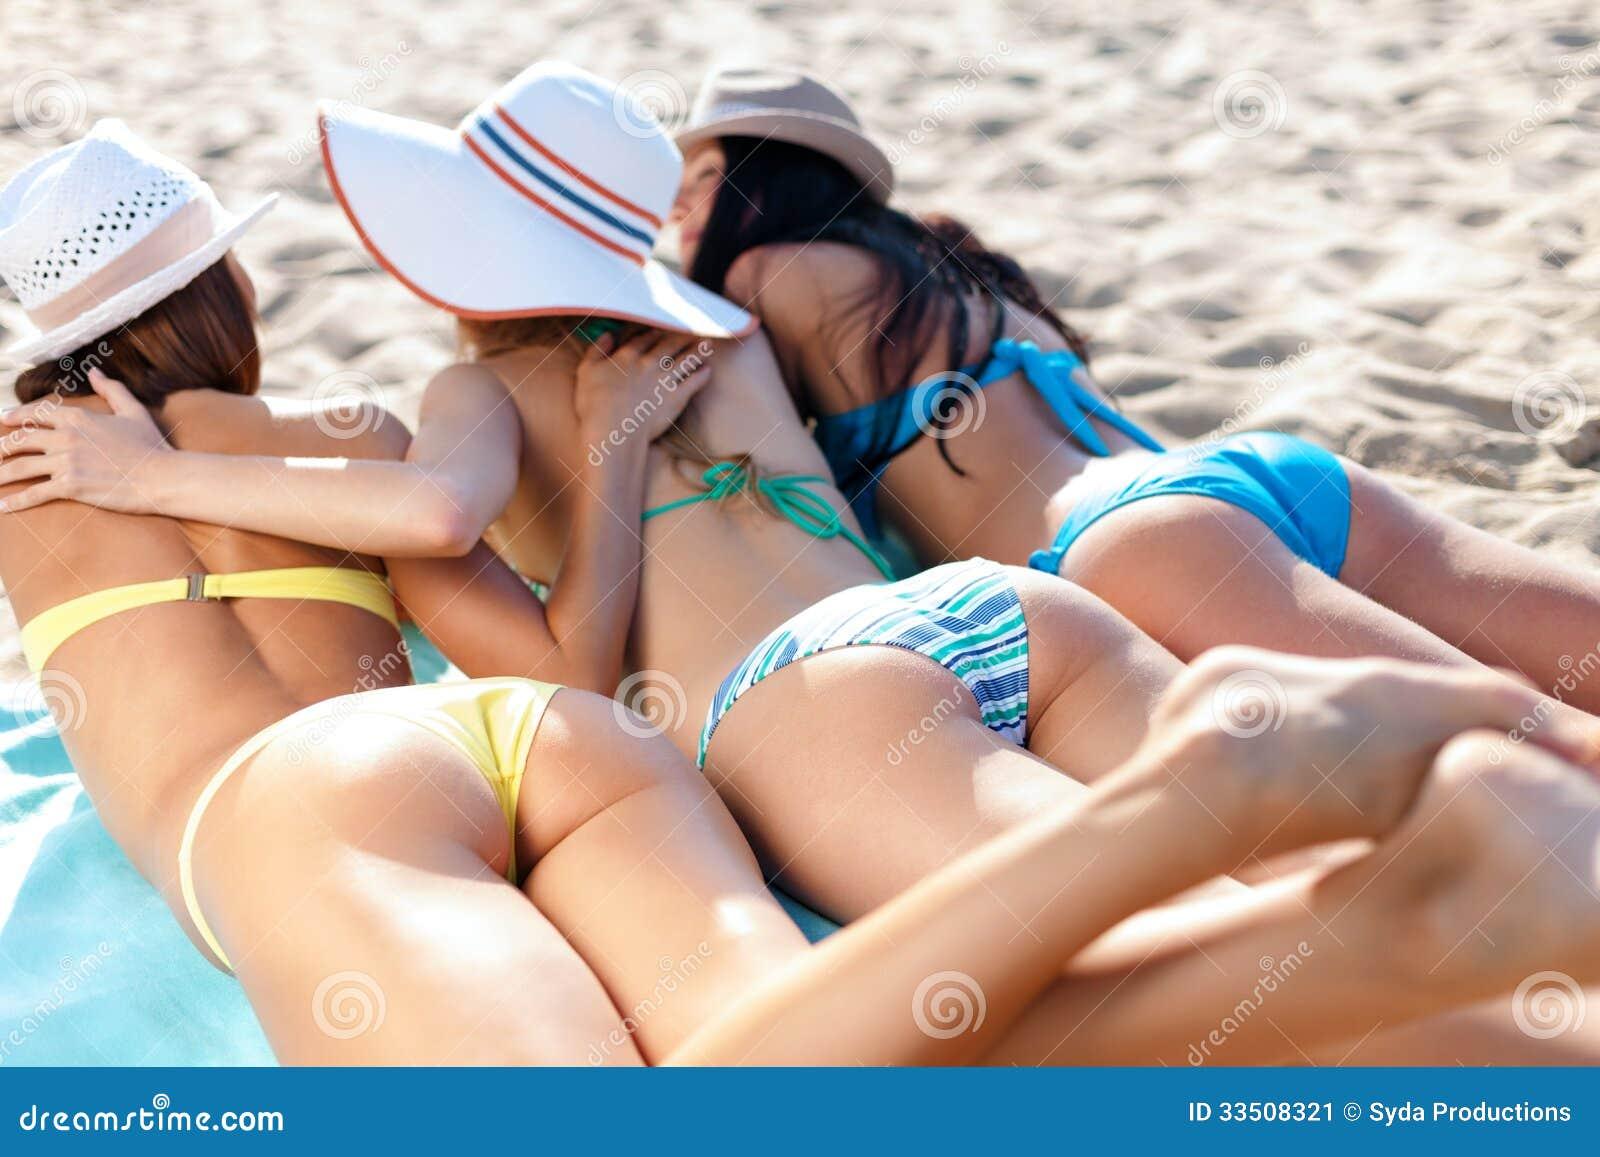 Sunbathing photos pics 92